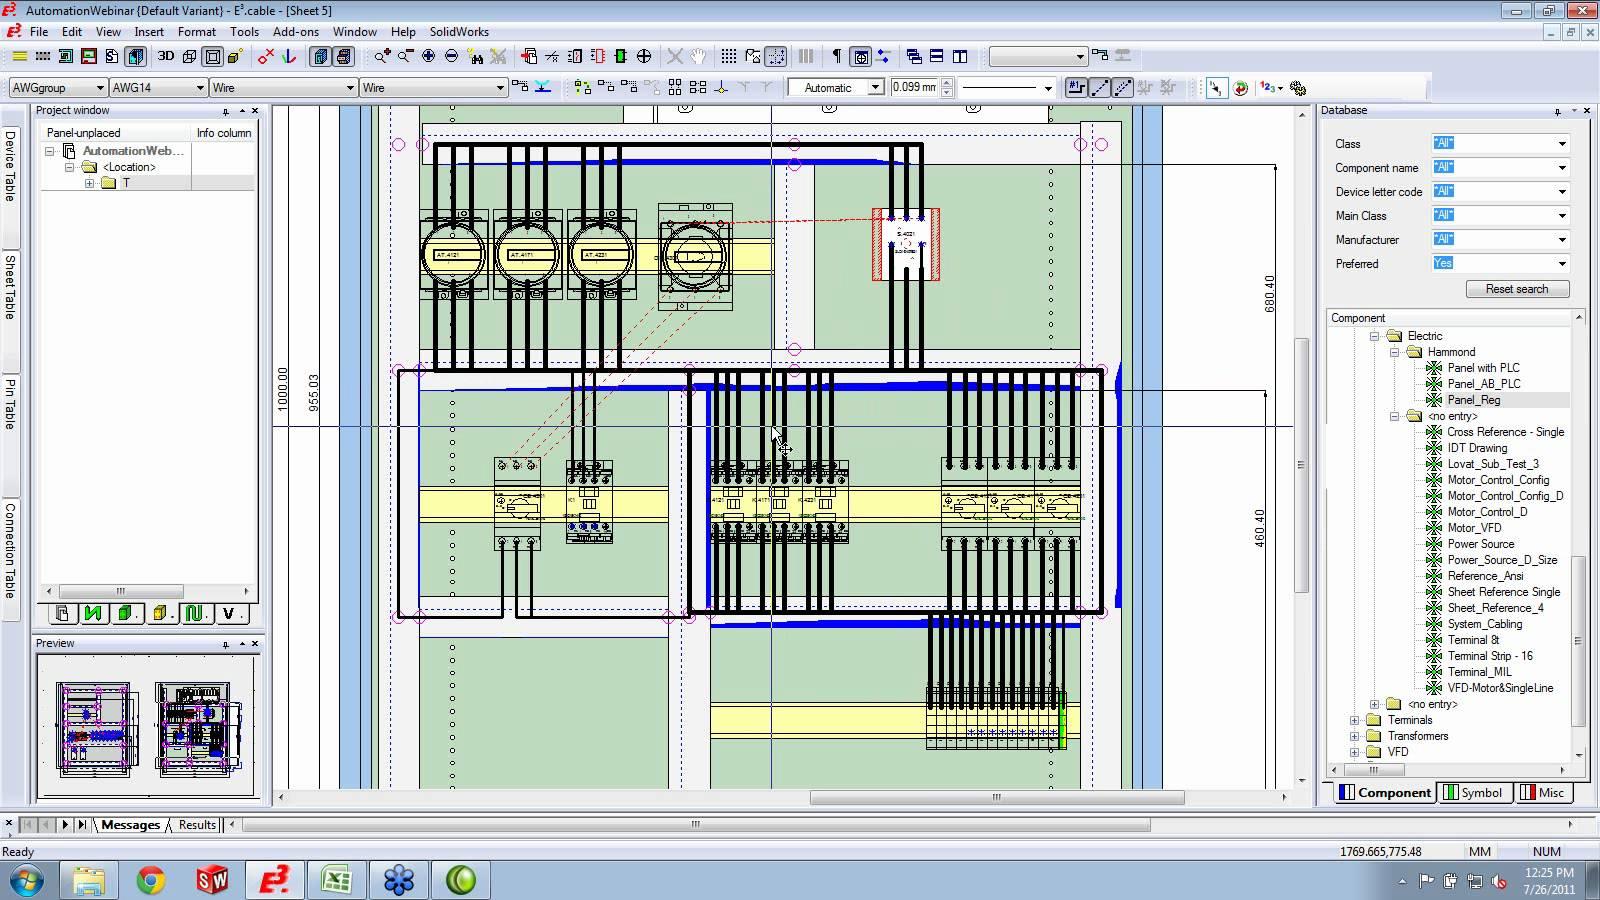 Ml 0411 Javelin Wiring Diagram Free Download Wiring Diagram Schematic Free Diagram